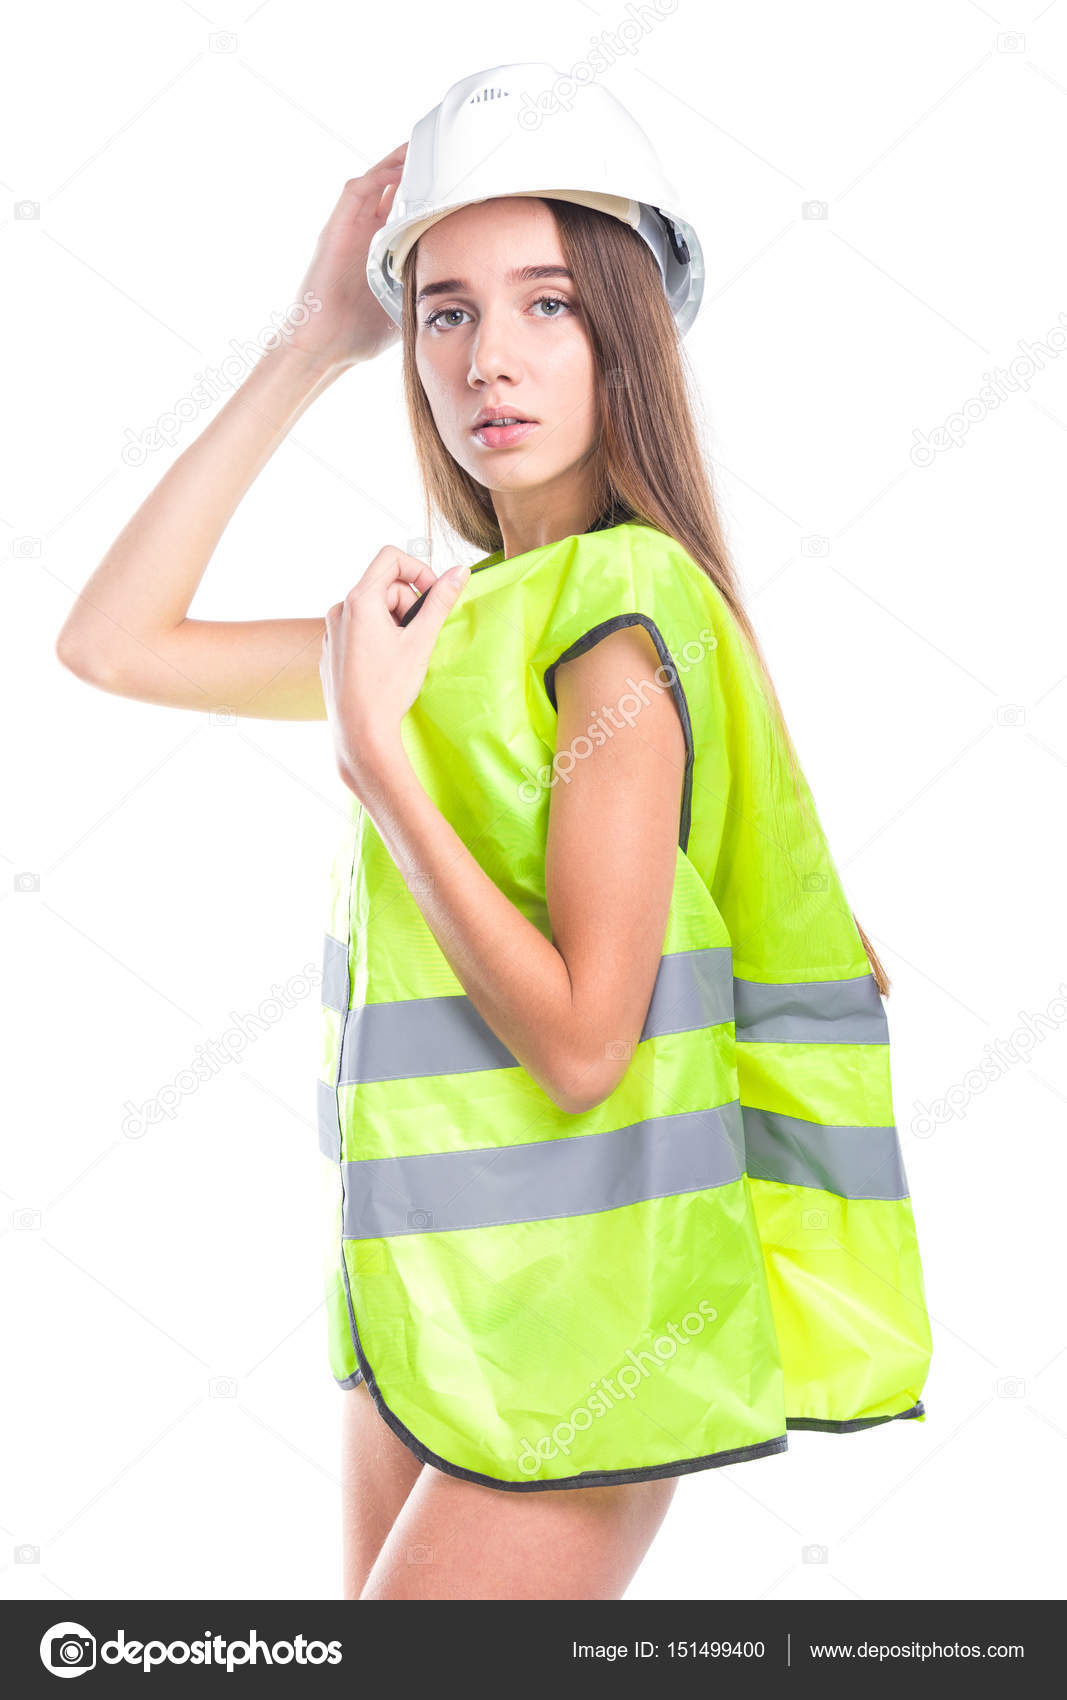 image: depositphotos_151499400-stock-photo-girl-in-yellow-construction-vest